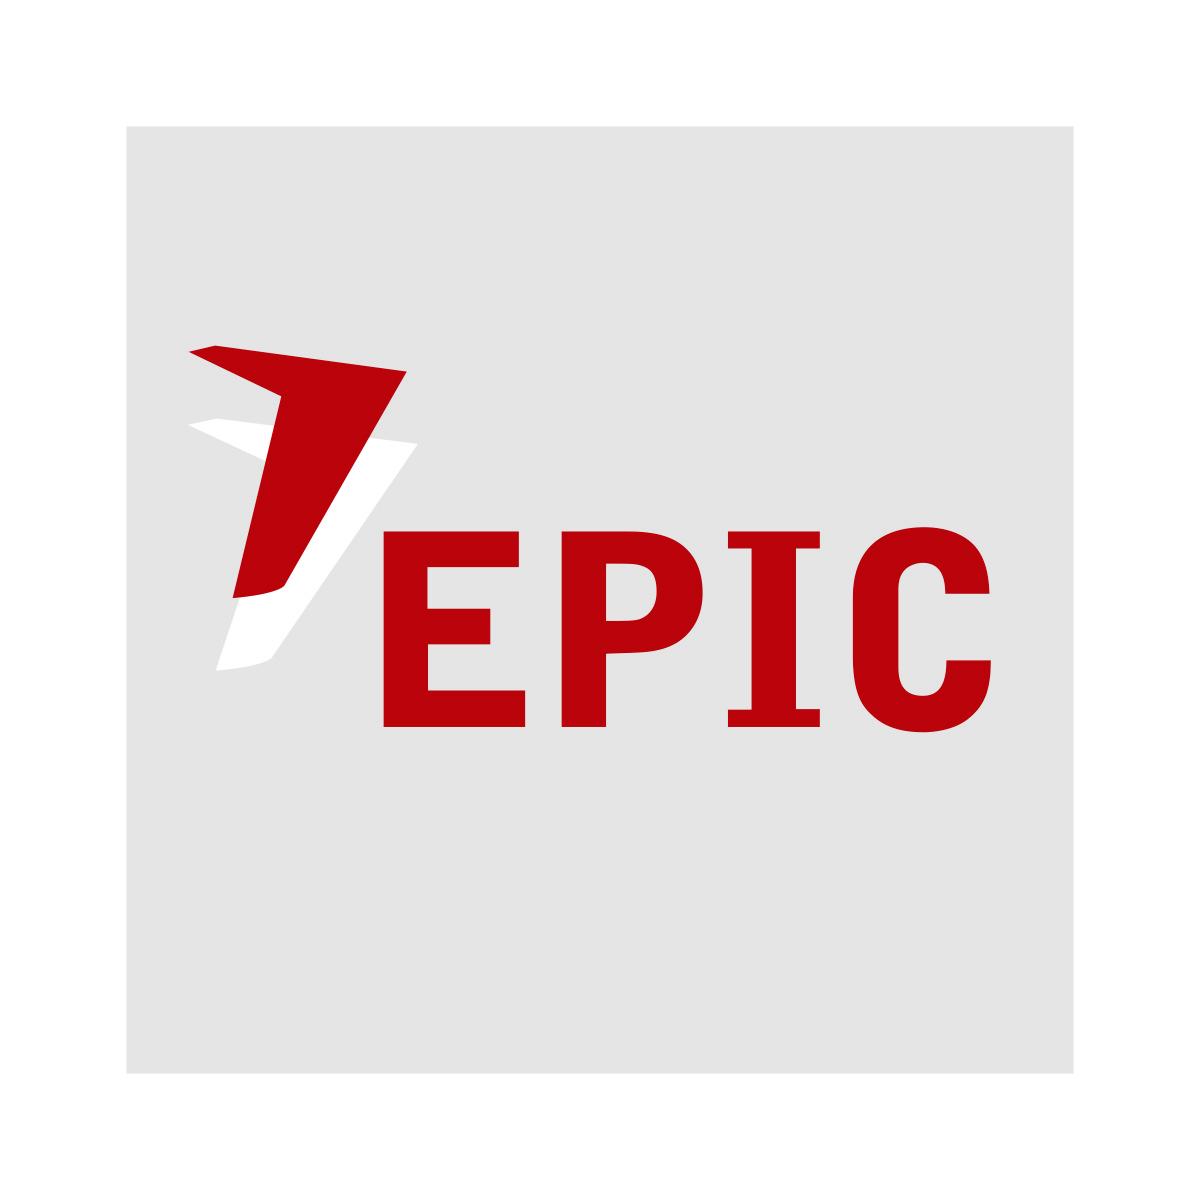 https://promotionplusinc.com/wp-content/uploads/2019/04/Epic-Aviation.jpg